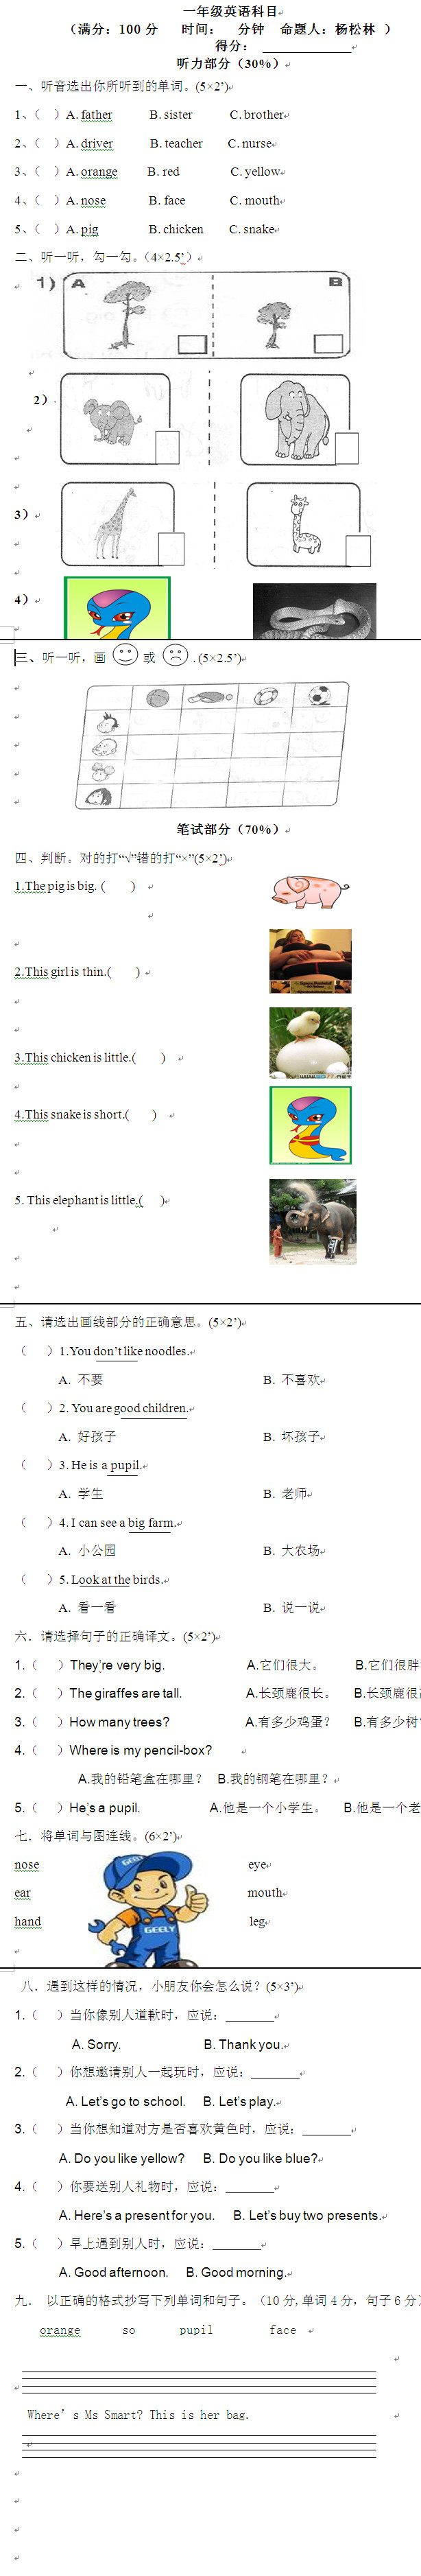 20xx学年度下学期英语期末考试题目